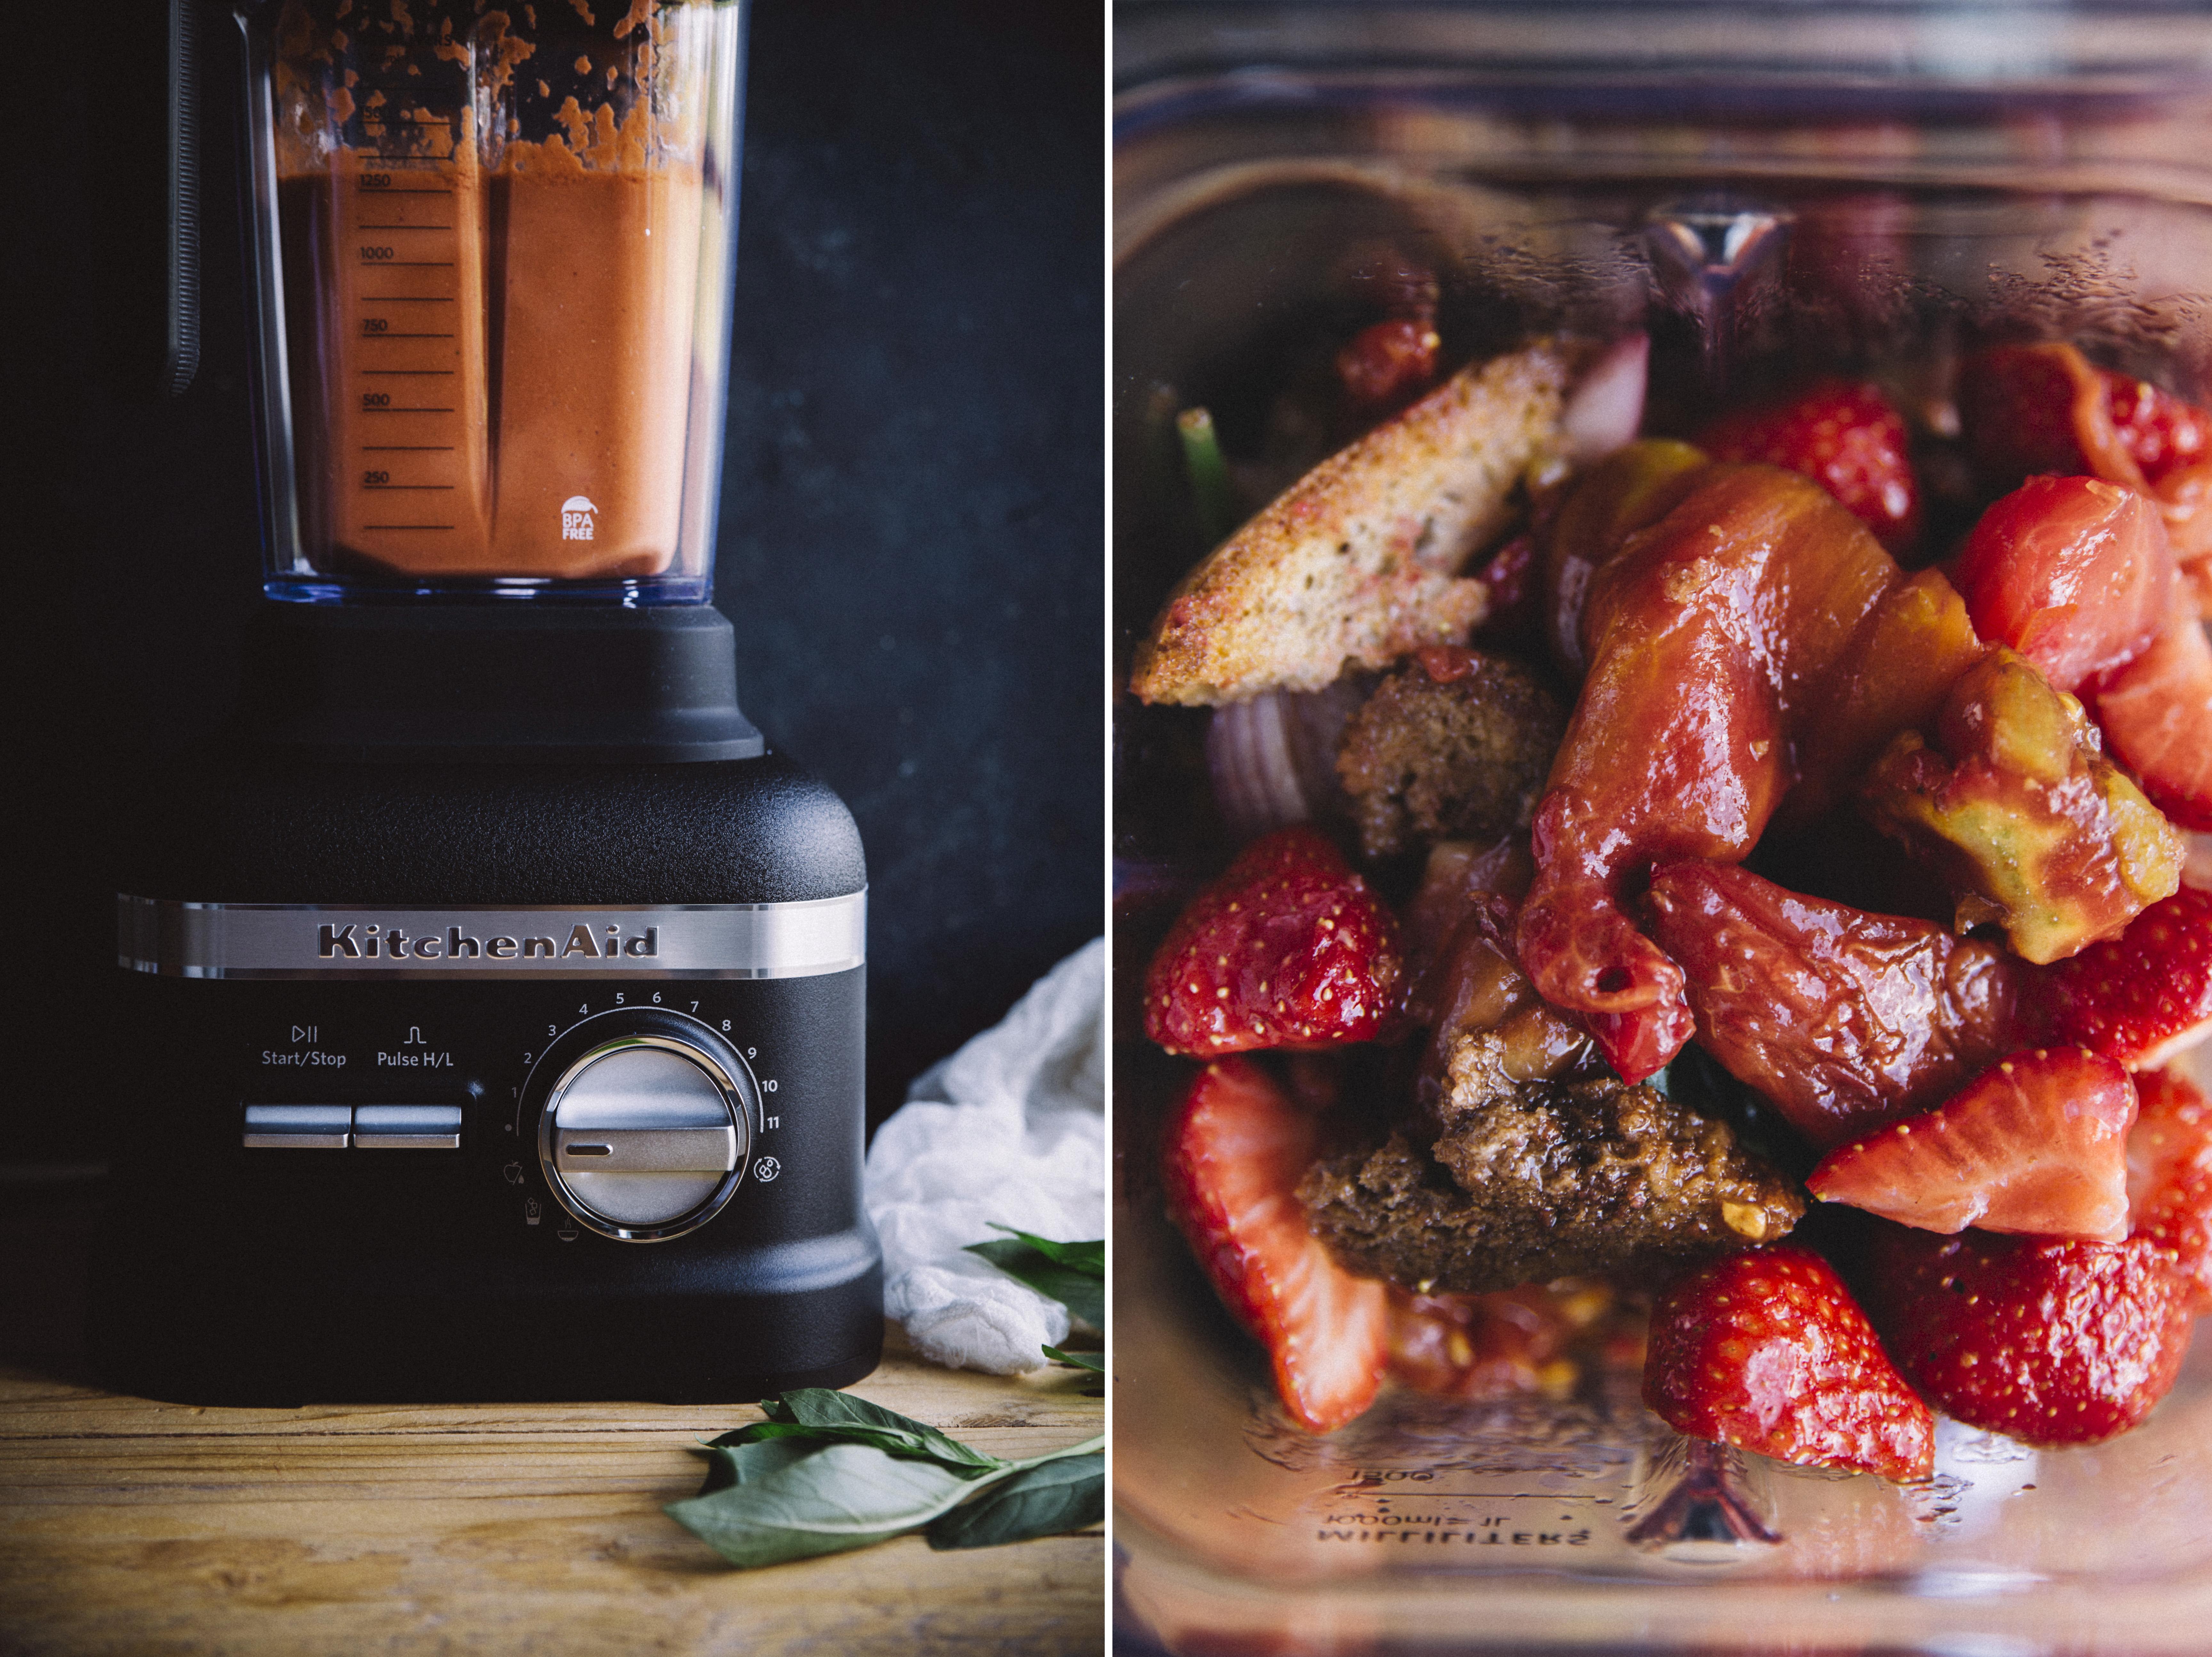 megandcook-kitchenaid-blender-7_2